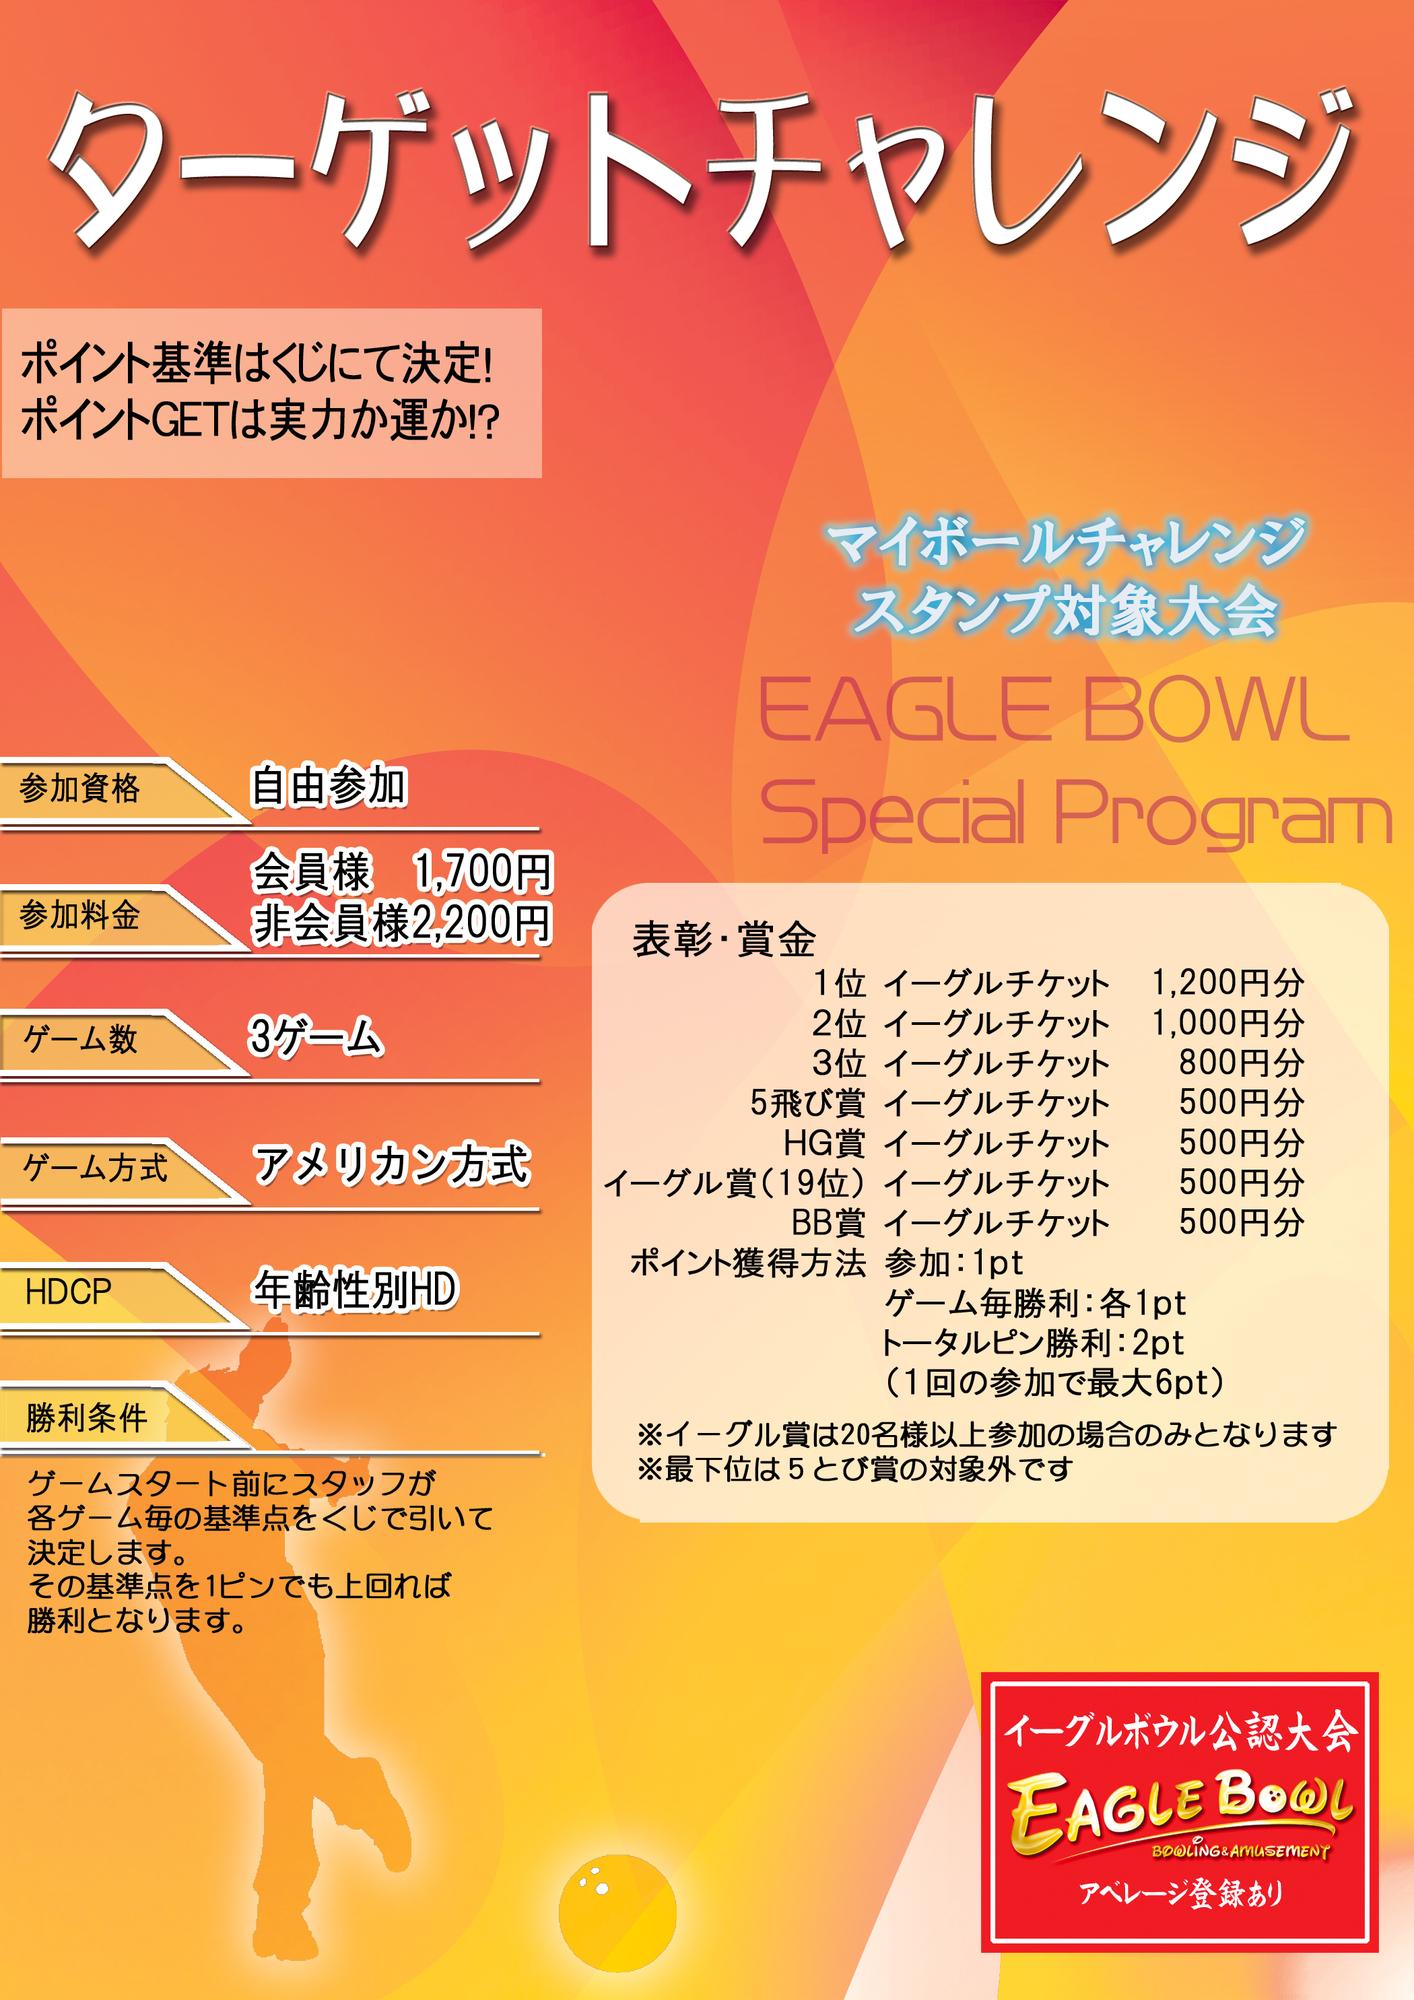 10/3 練習会&新大会ご案内